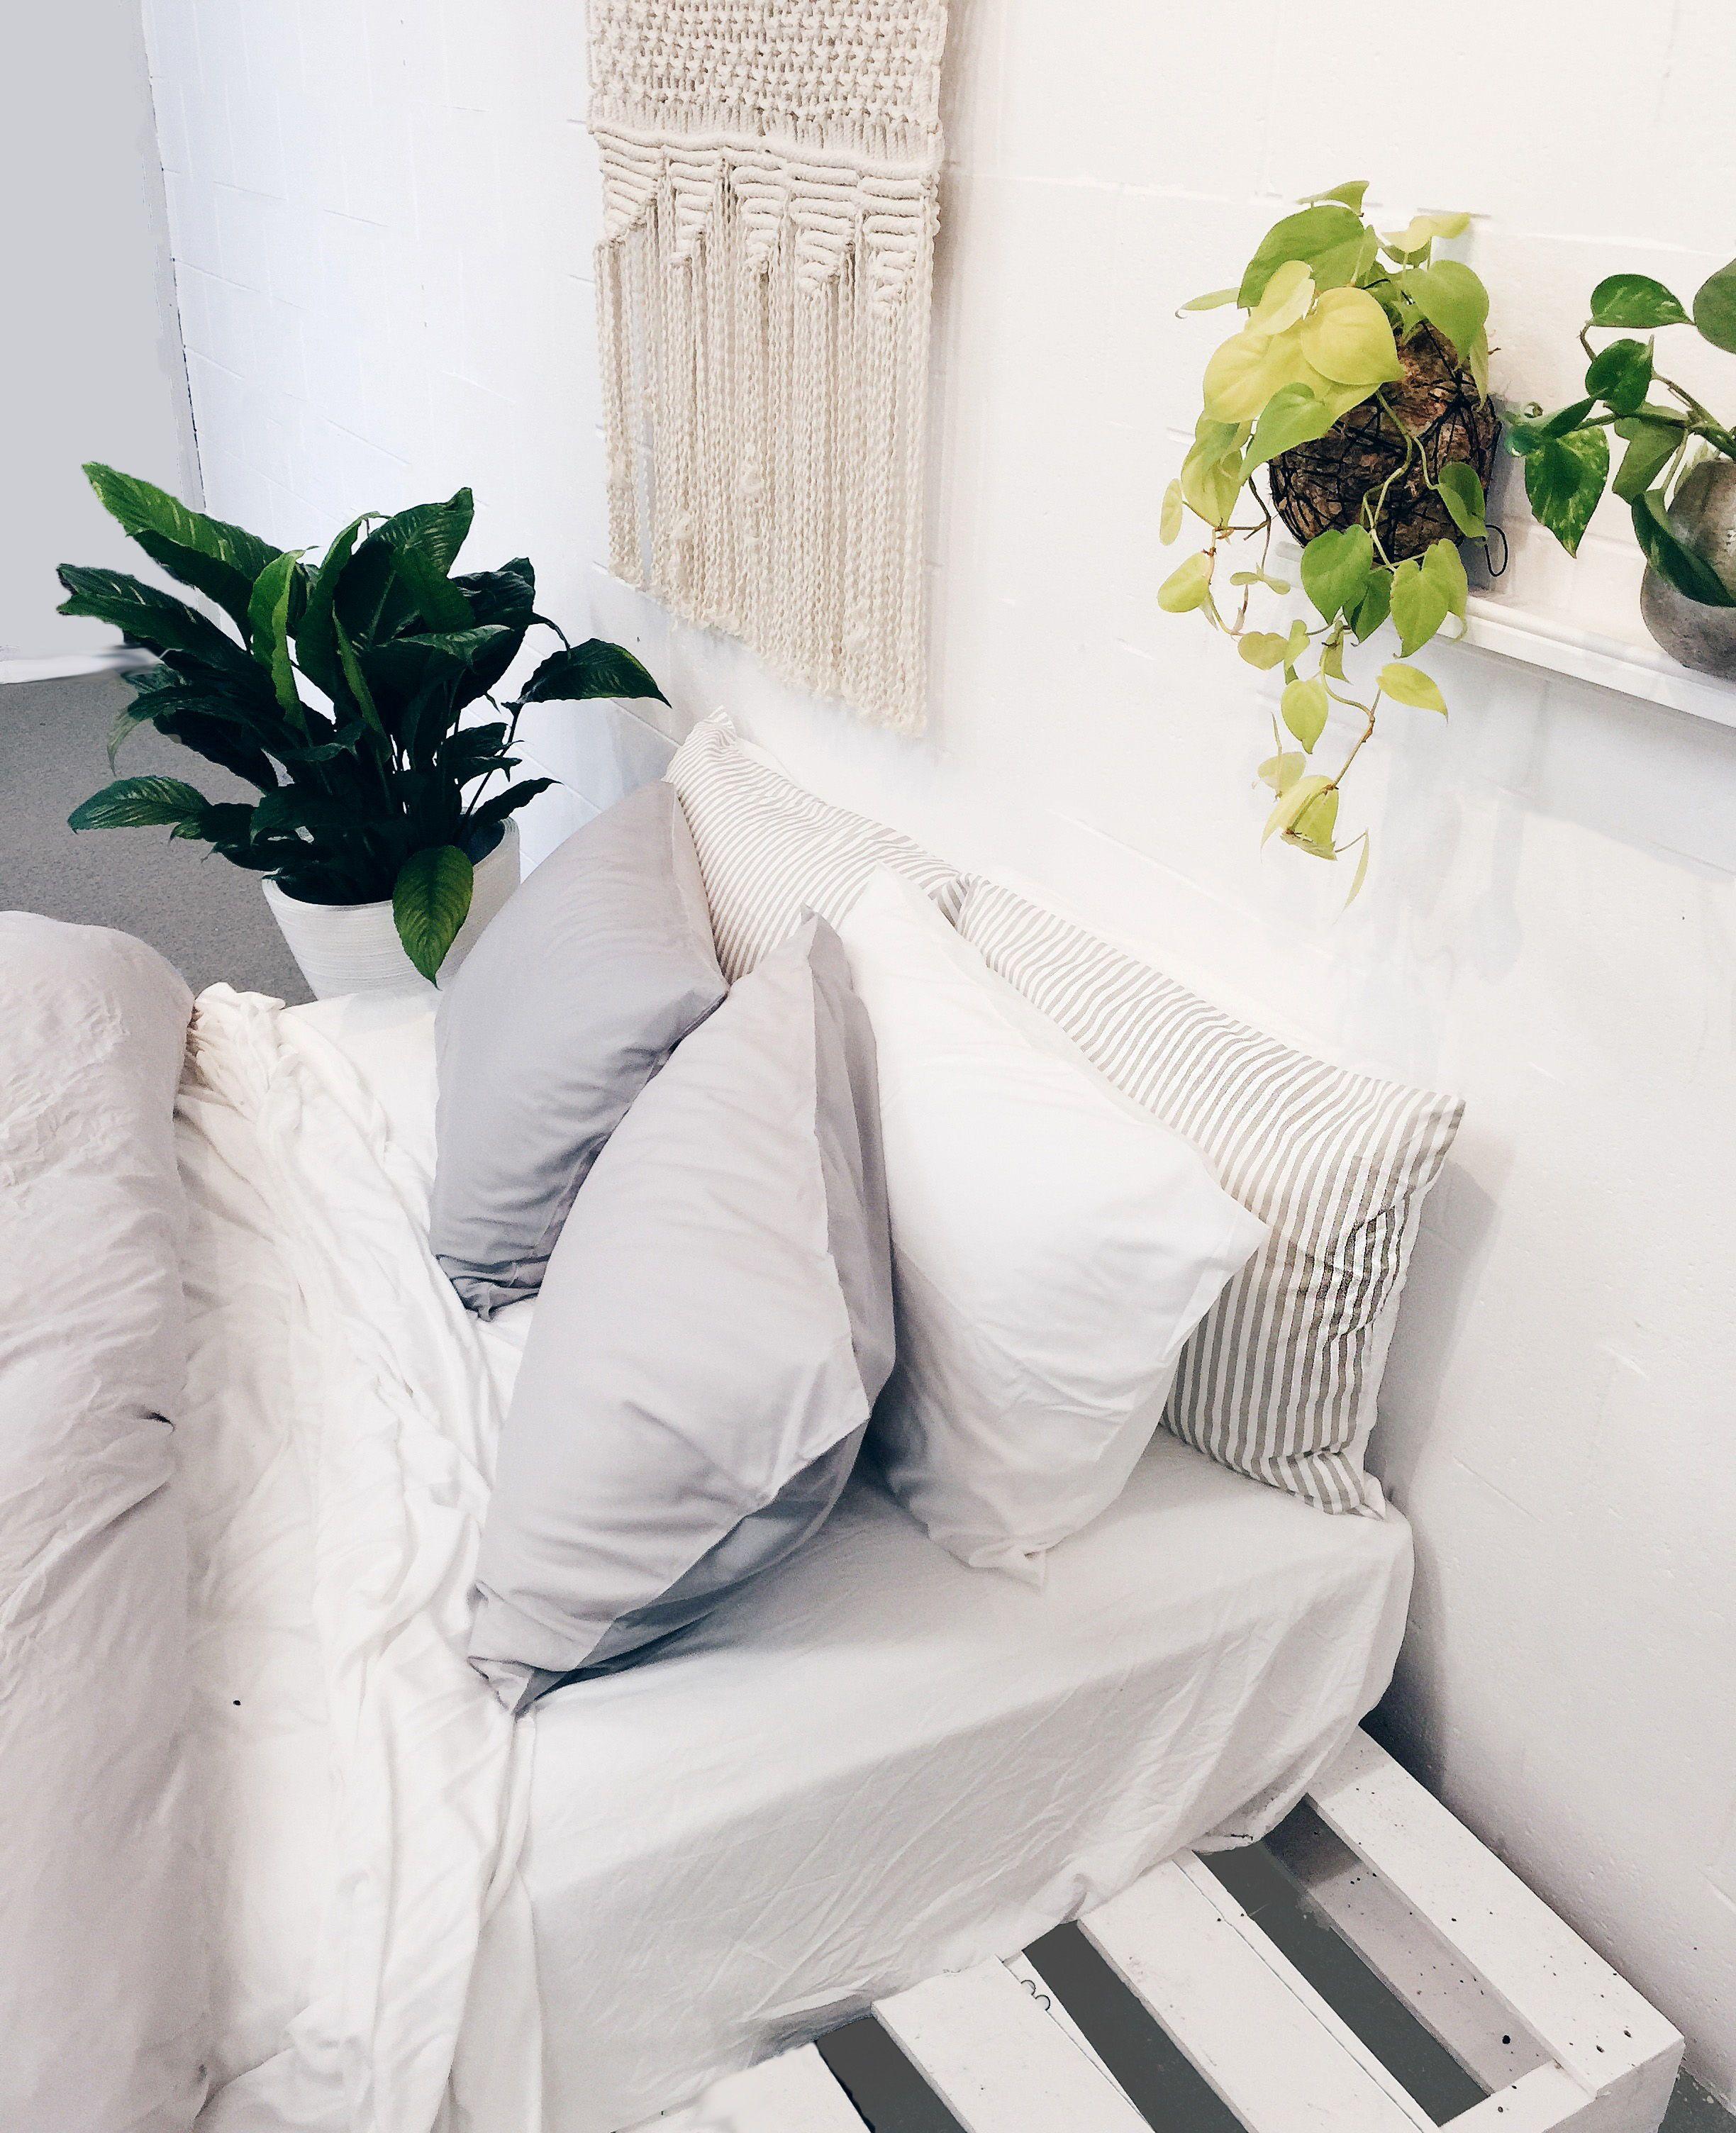 Bamboo Vs Bamboo Charcoal Black Bed Linen Pillows Home